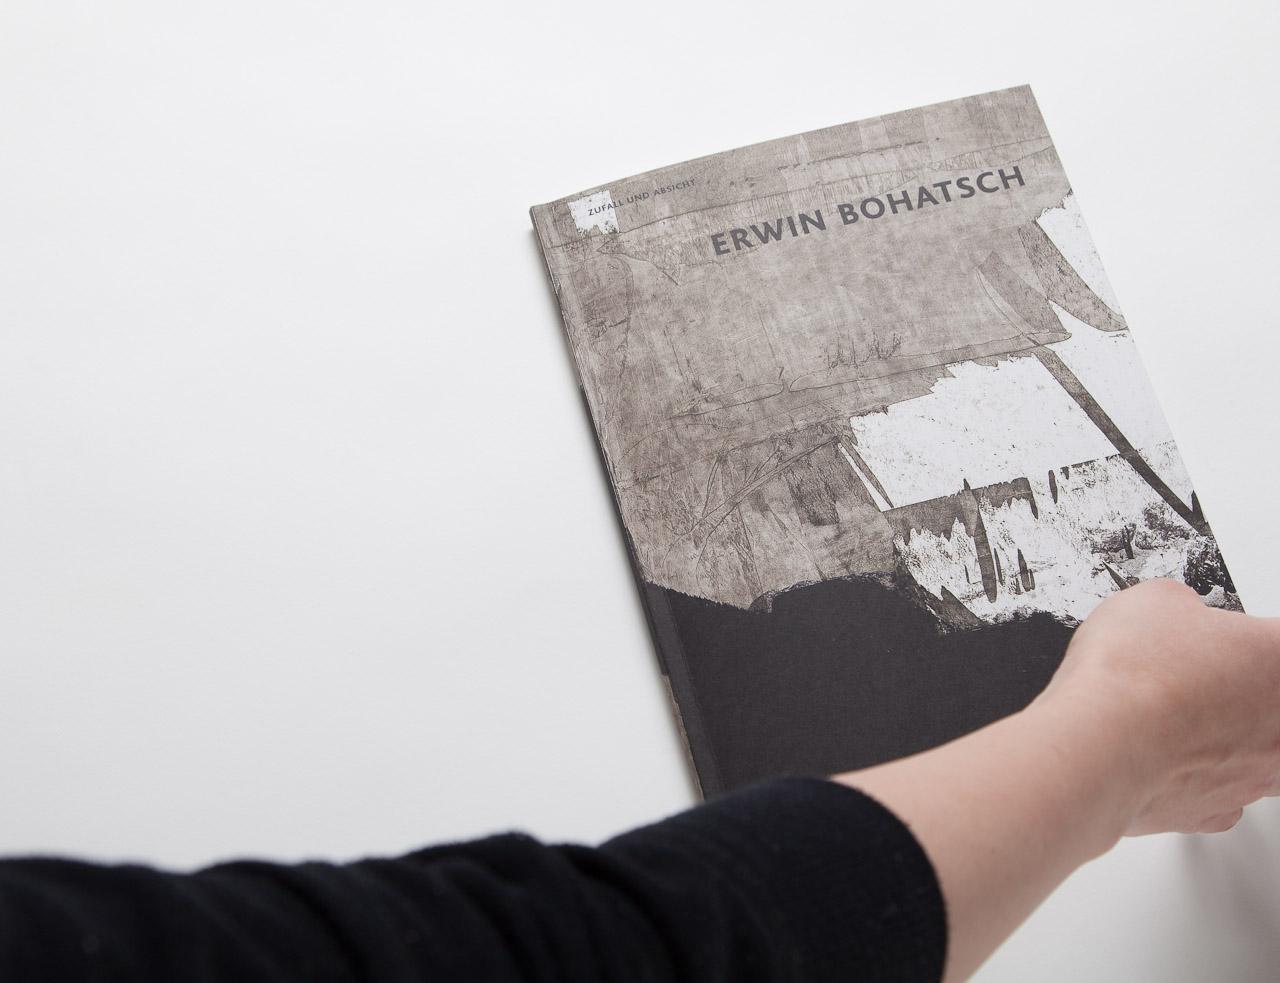 Erwin_Bohatsch_Katalog-8845